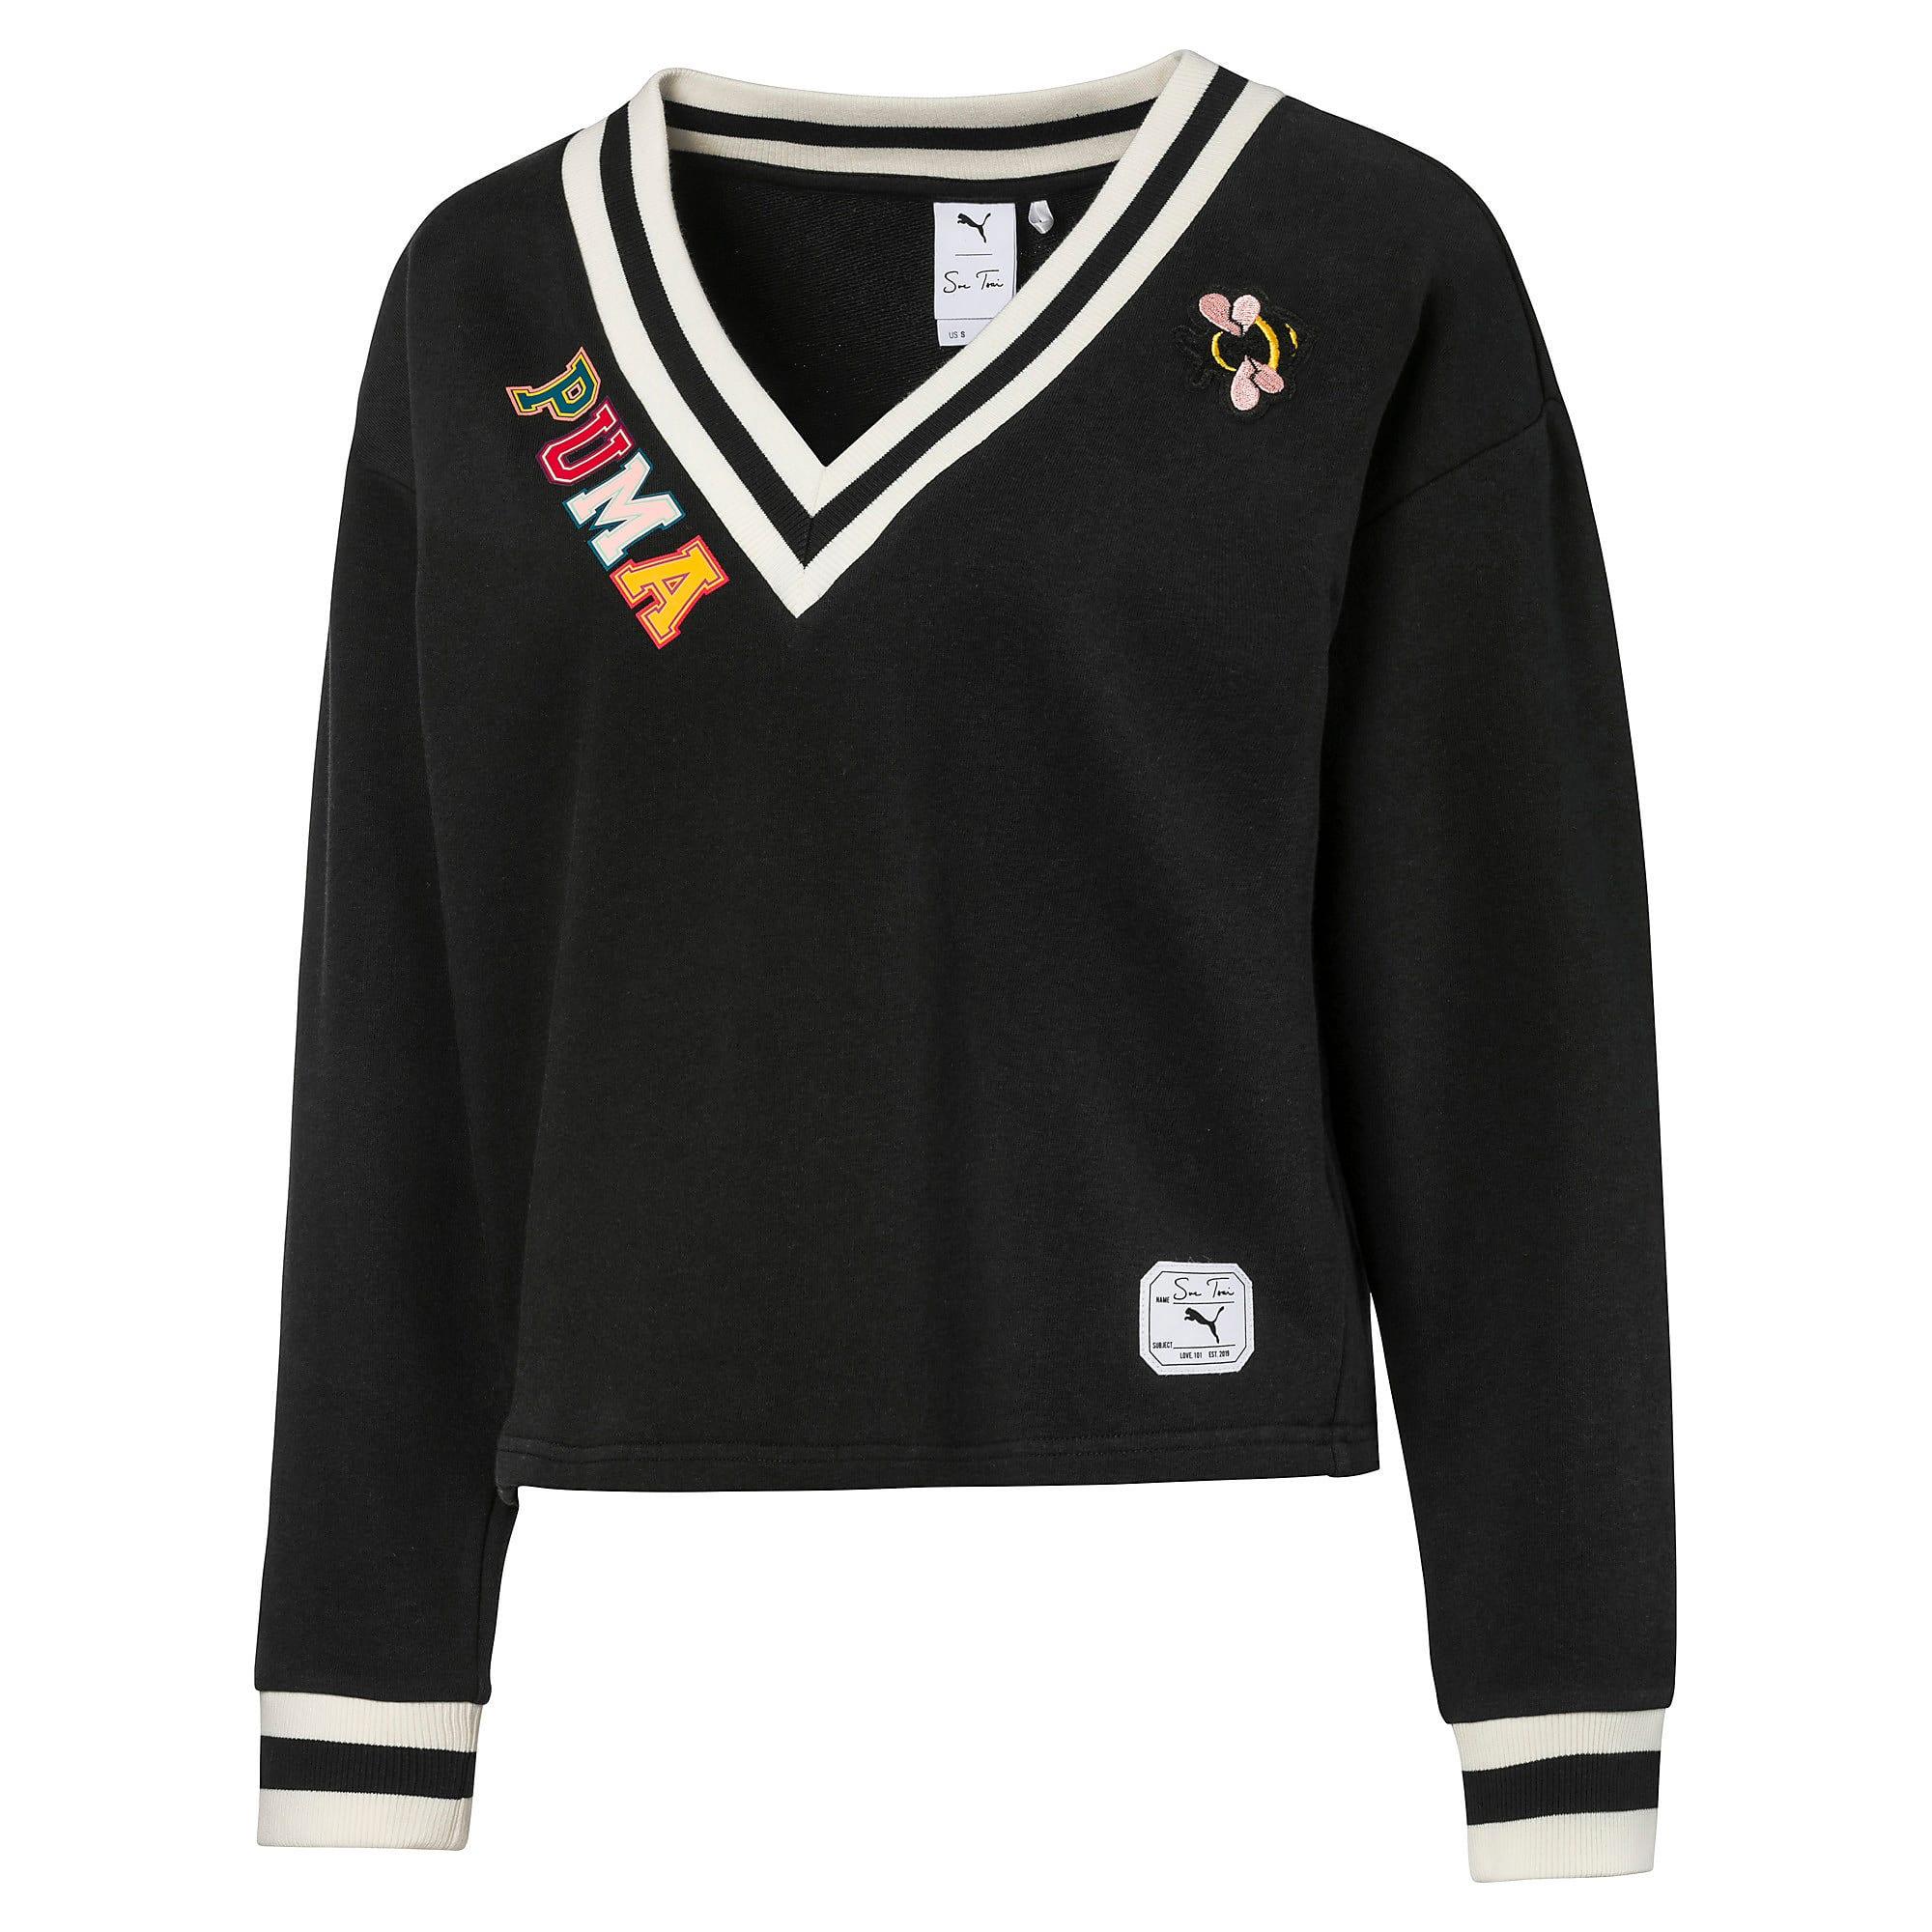 Thumbnail 1 of PUMA x SUE TSAI ウィメンズ Vネック セーター, Puma Black, medium-JPN